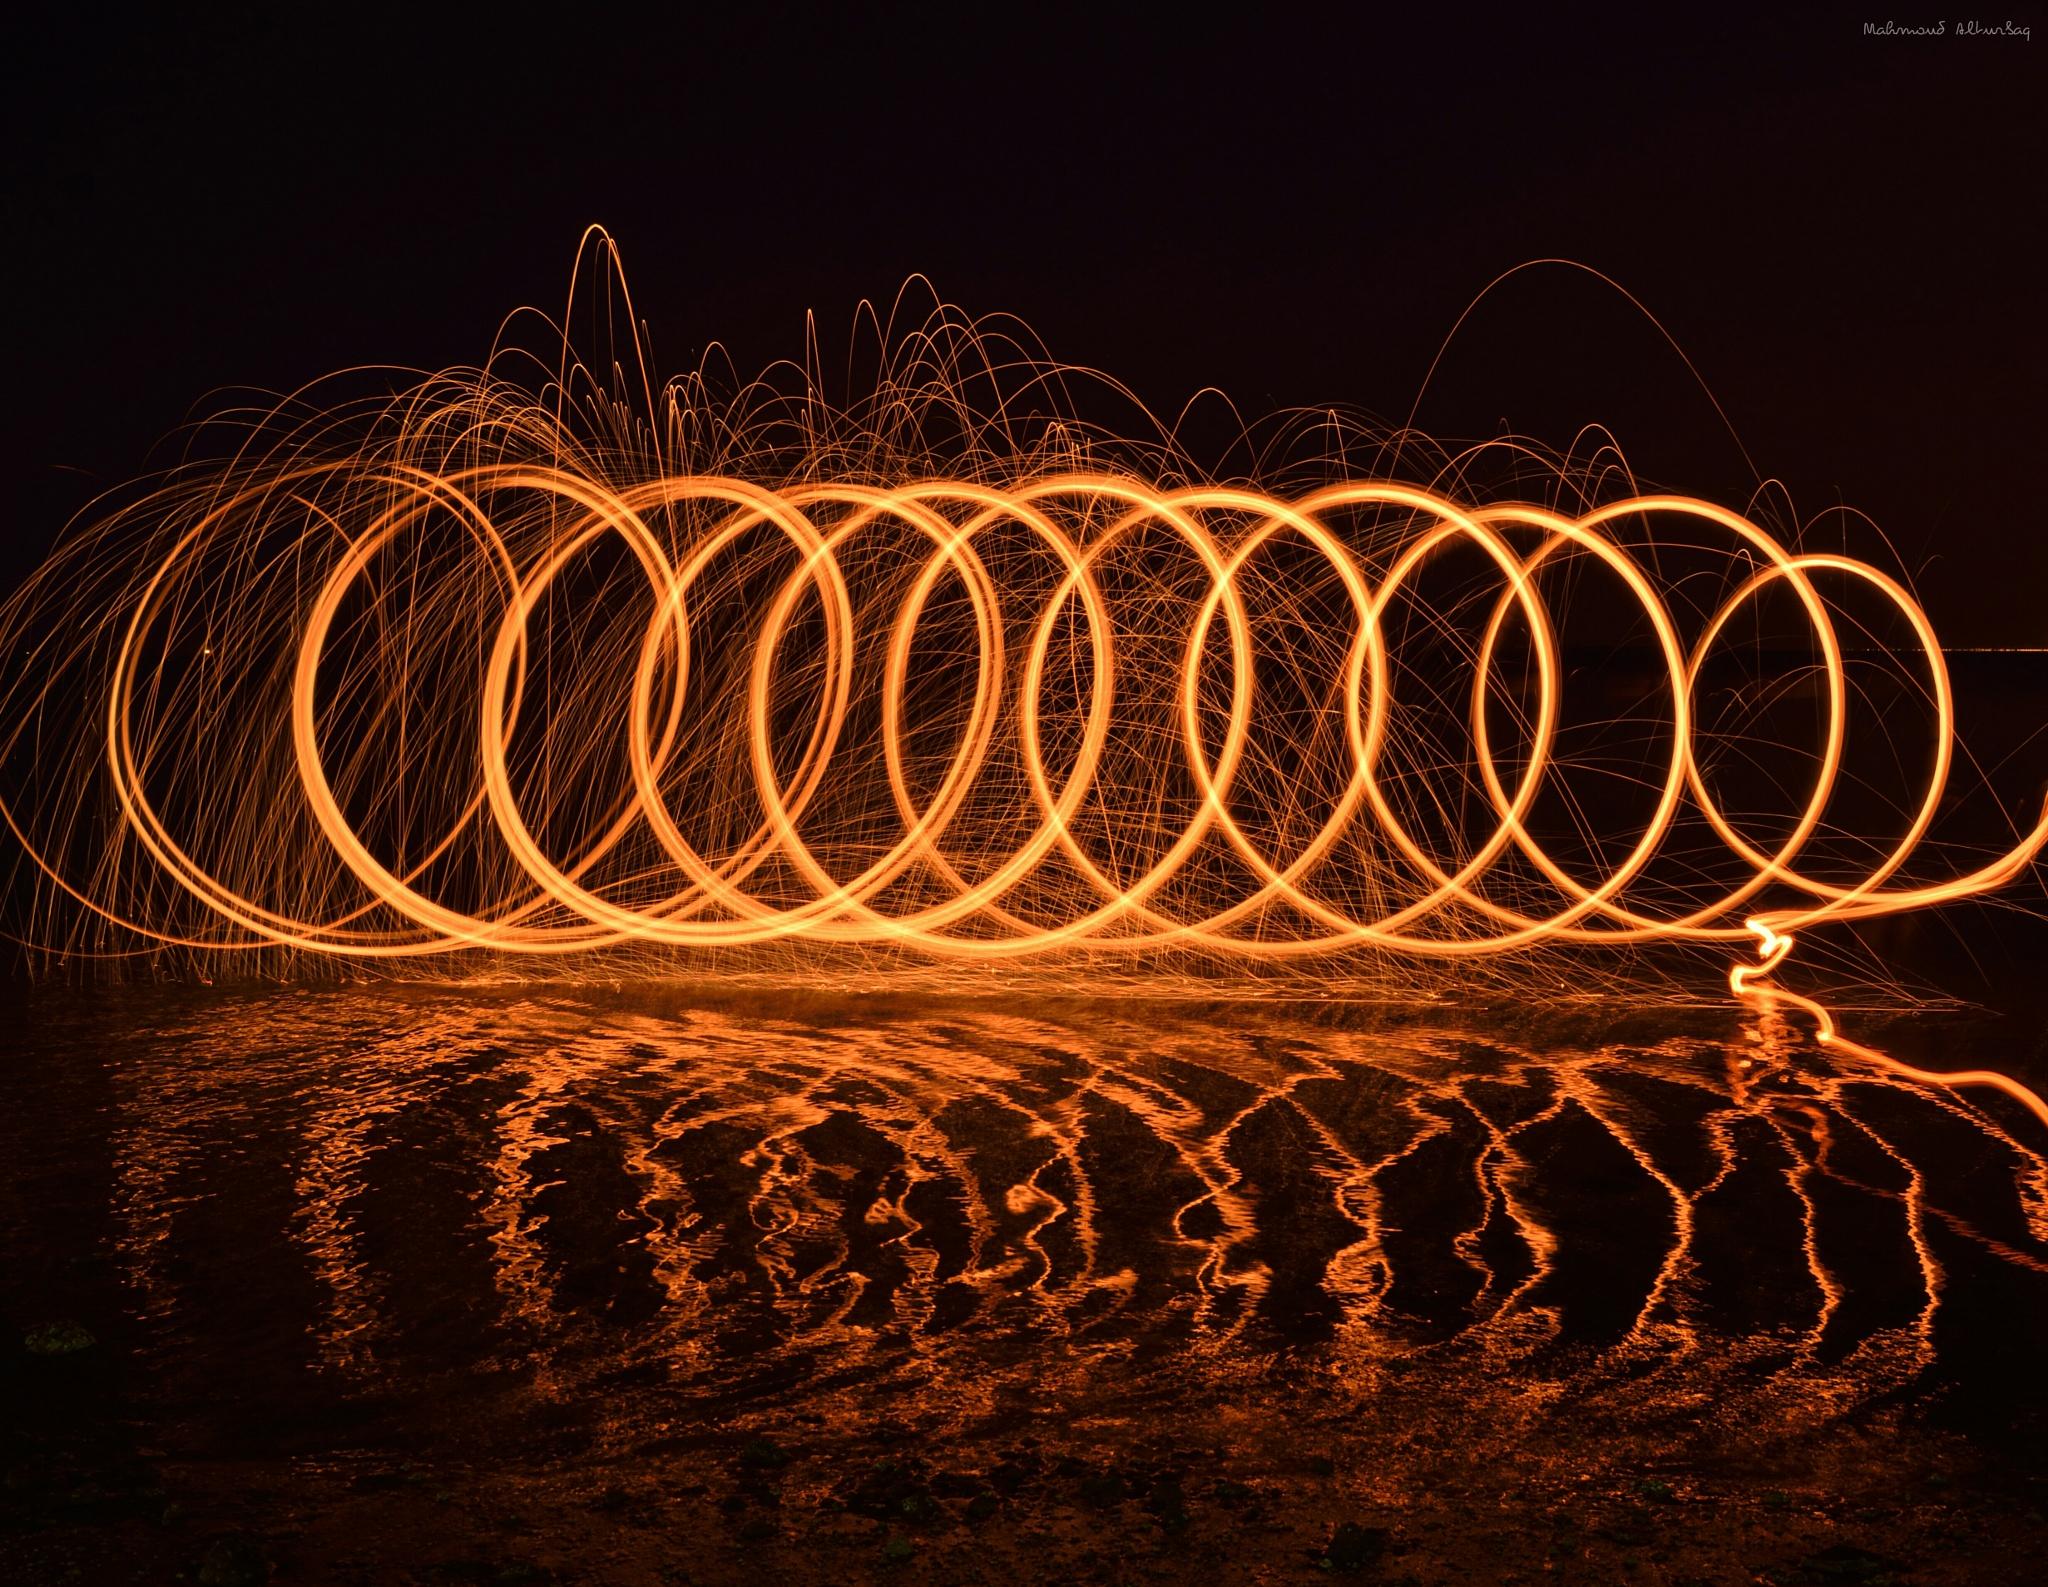 Steelwool on the beach by Mahmoud Alturbaq